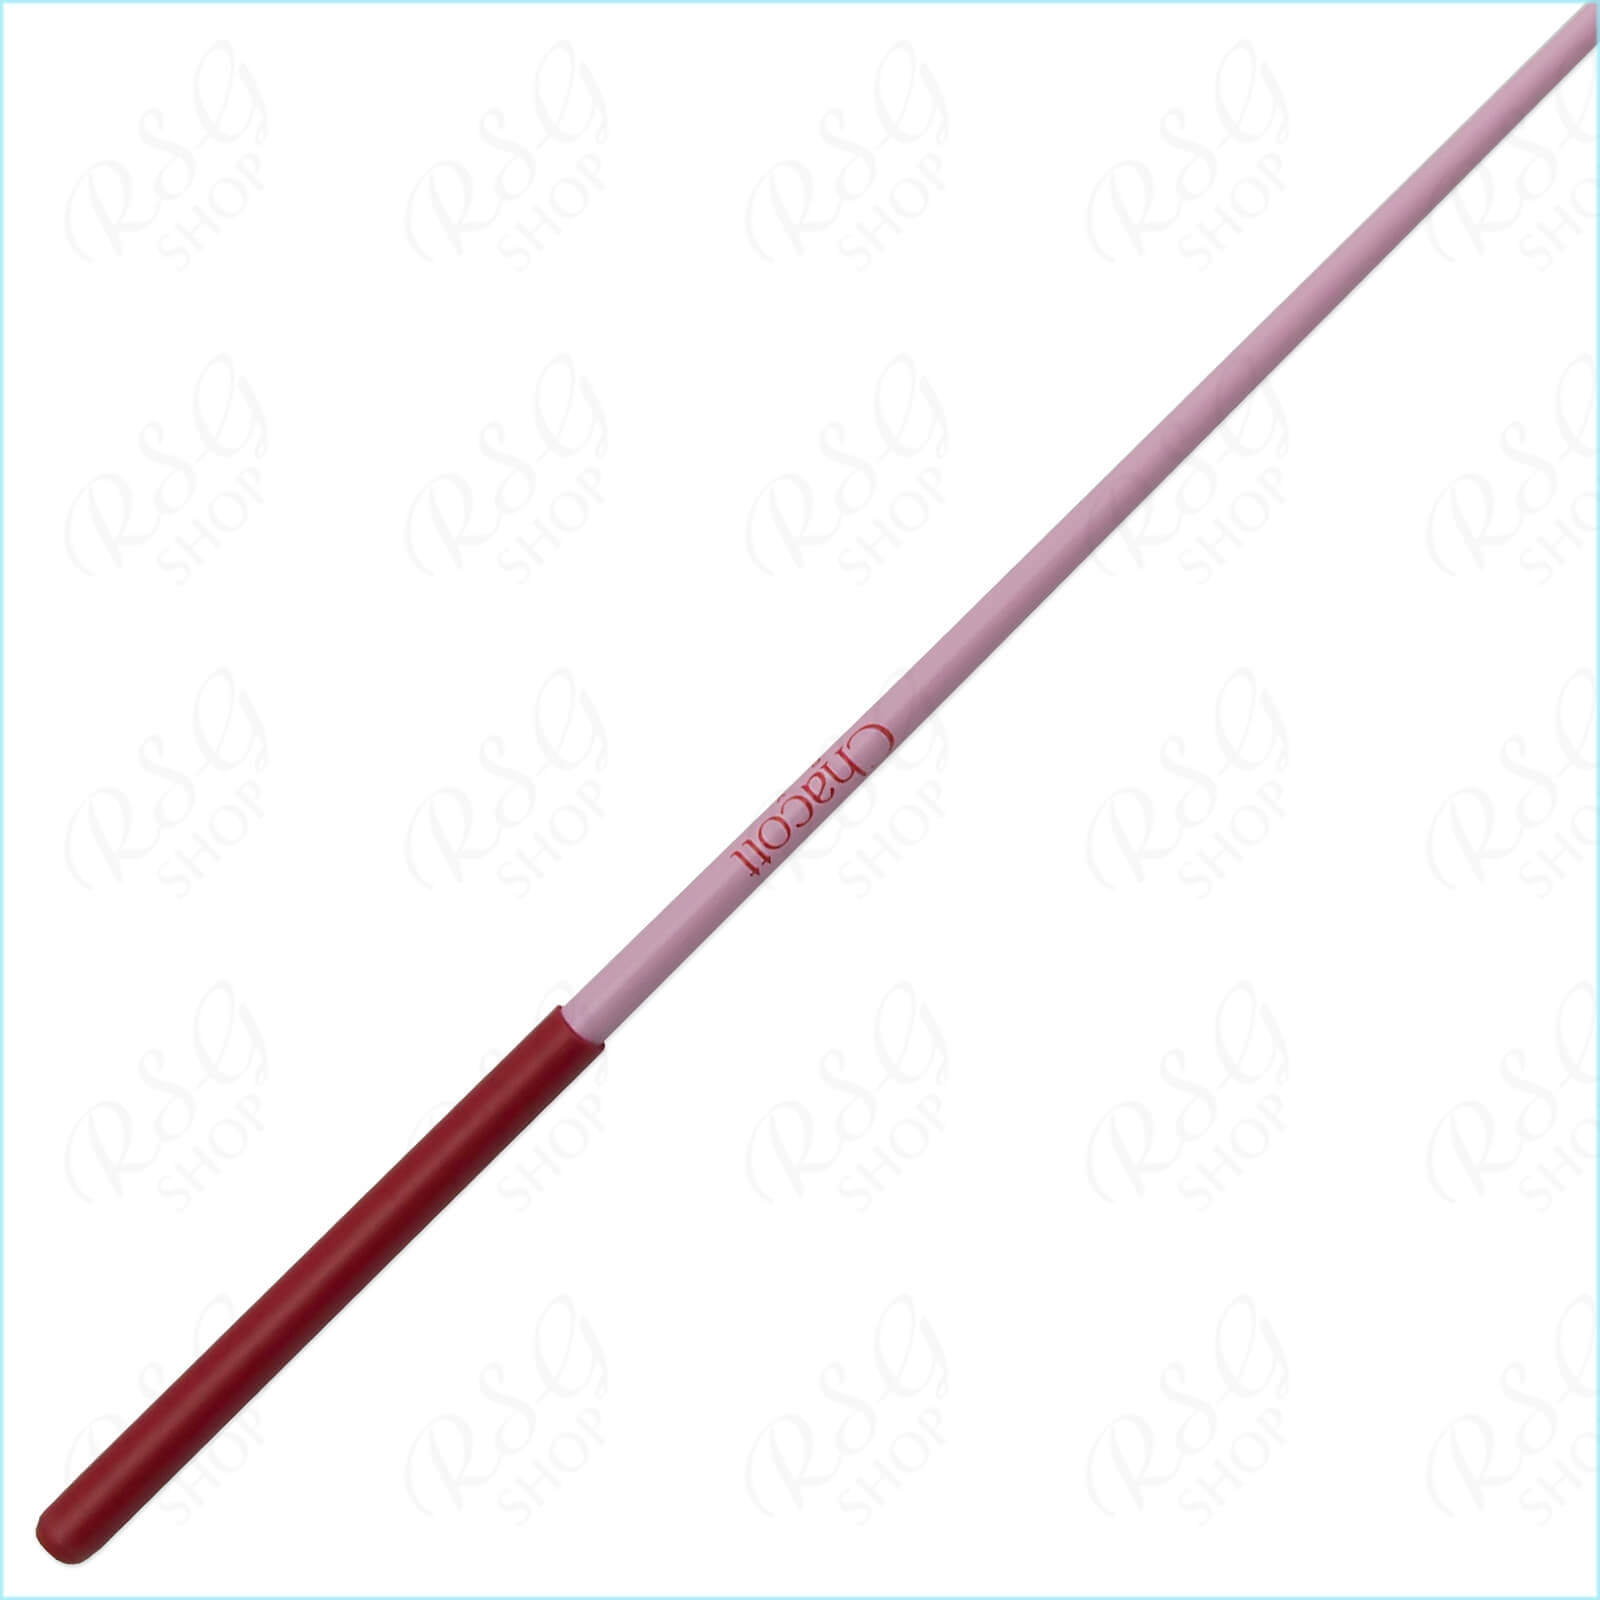 stab_chacott_junior_standart_50cm_cherry_pink